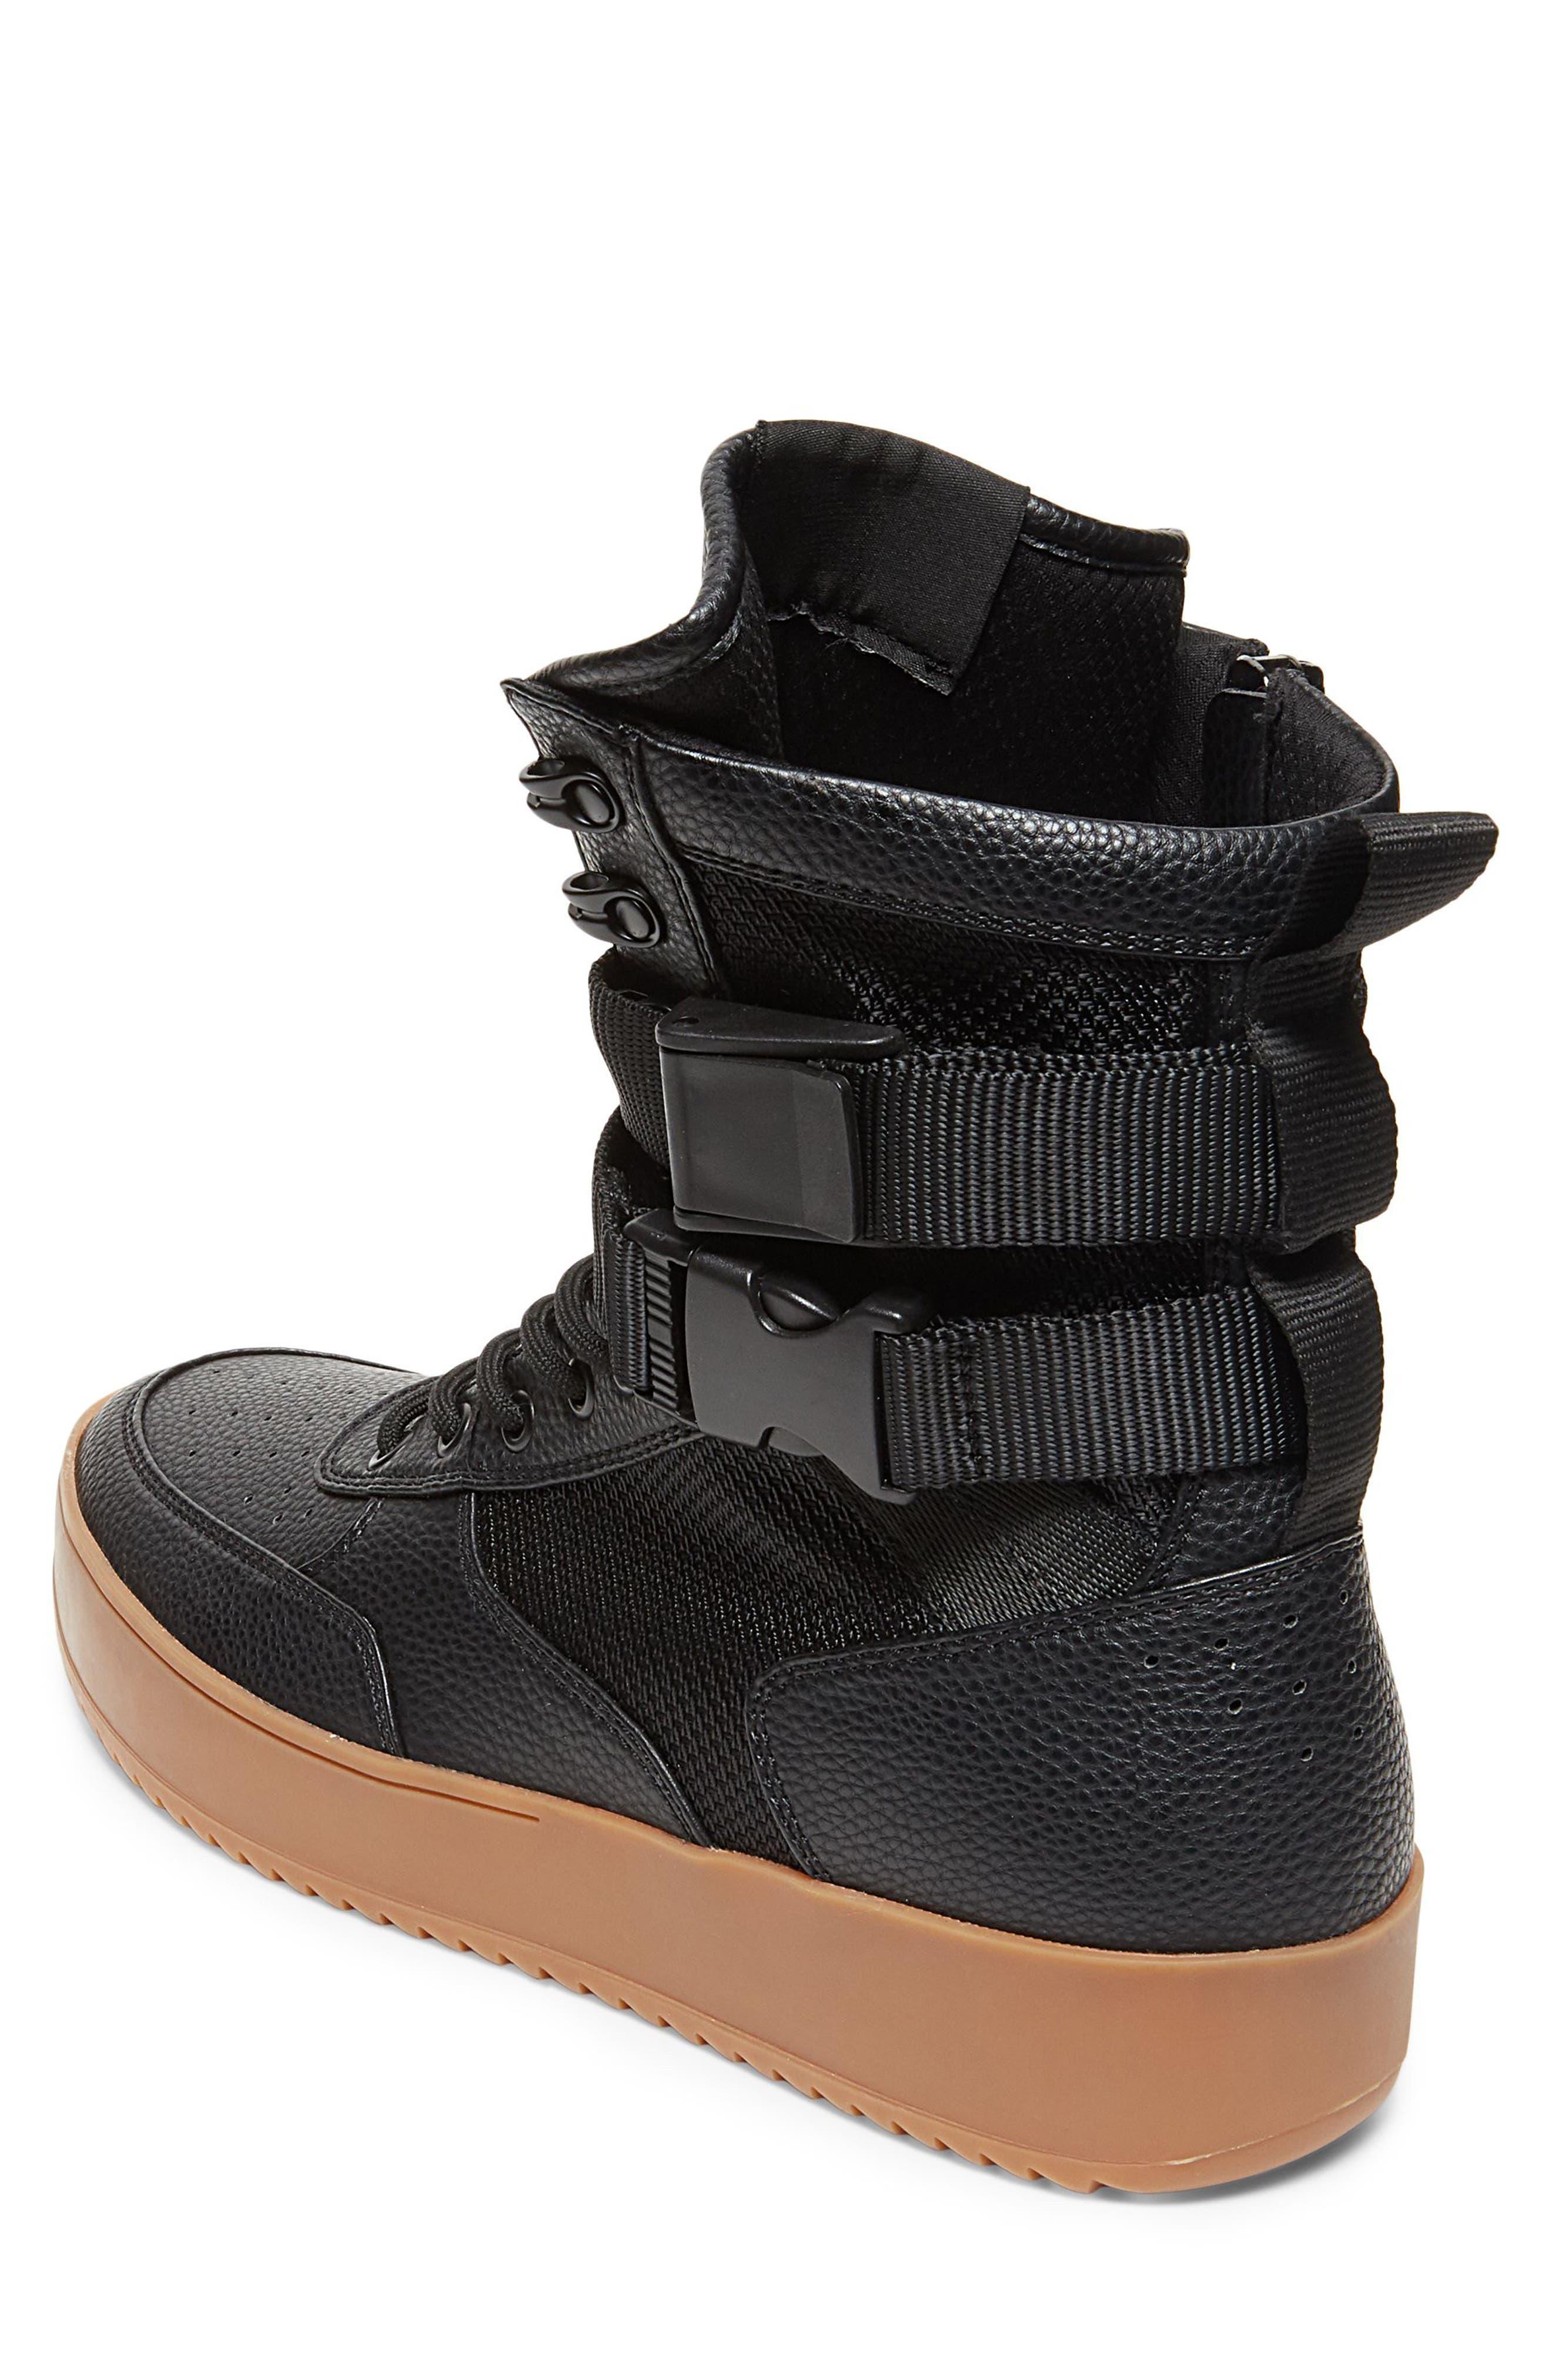 Zeroday Sneaker,                             Alternate thumbnail 4, color,